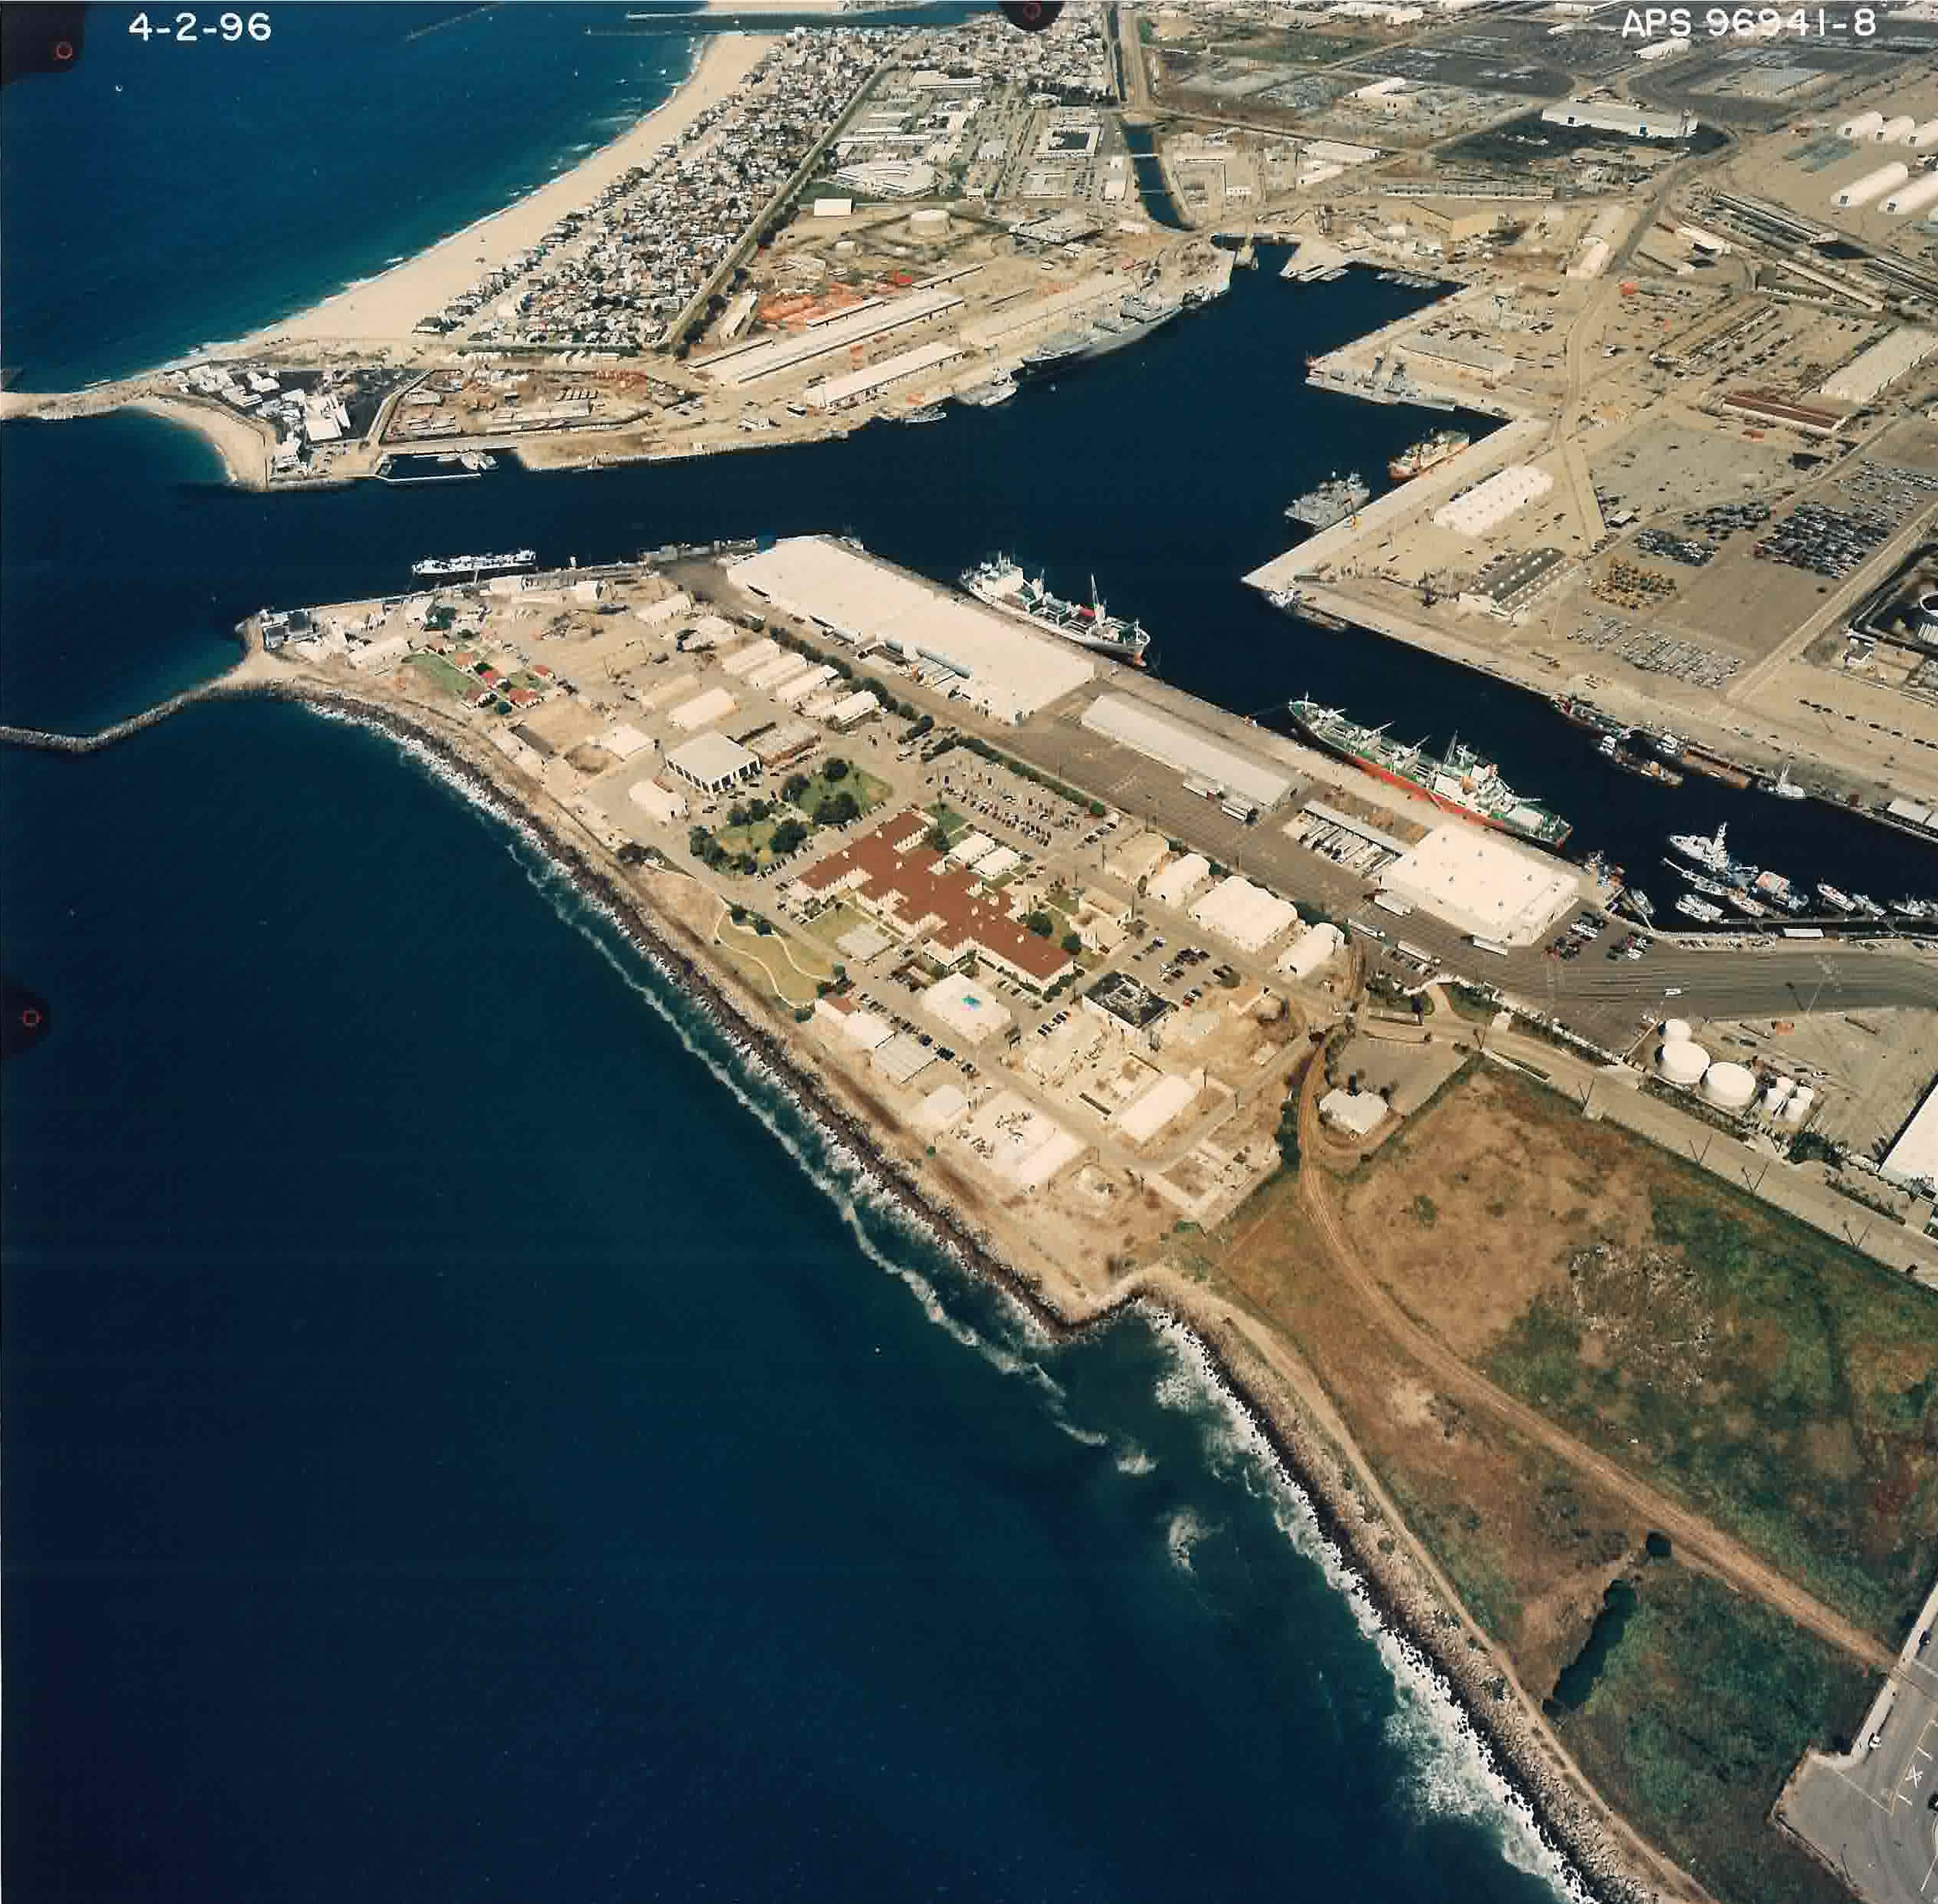 Port Hueneme Harbor